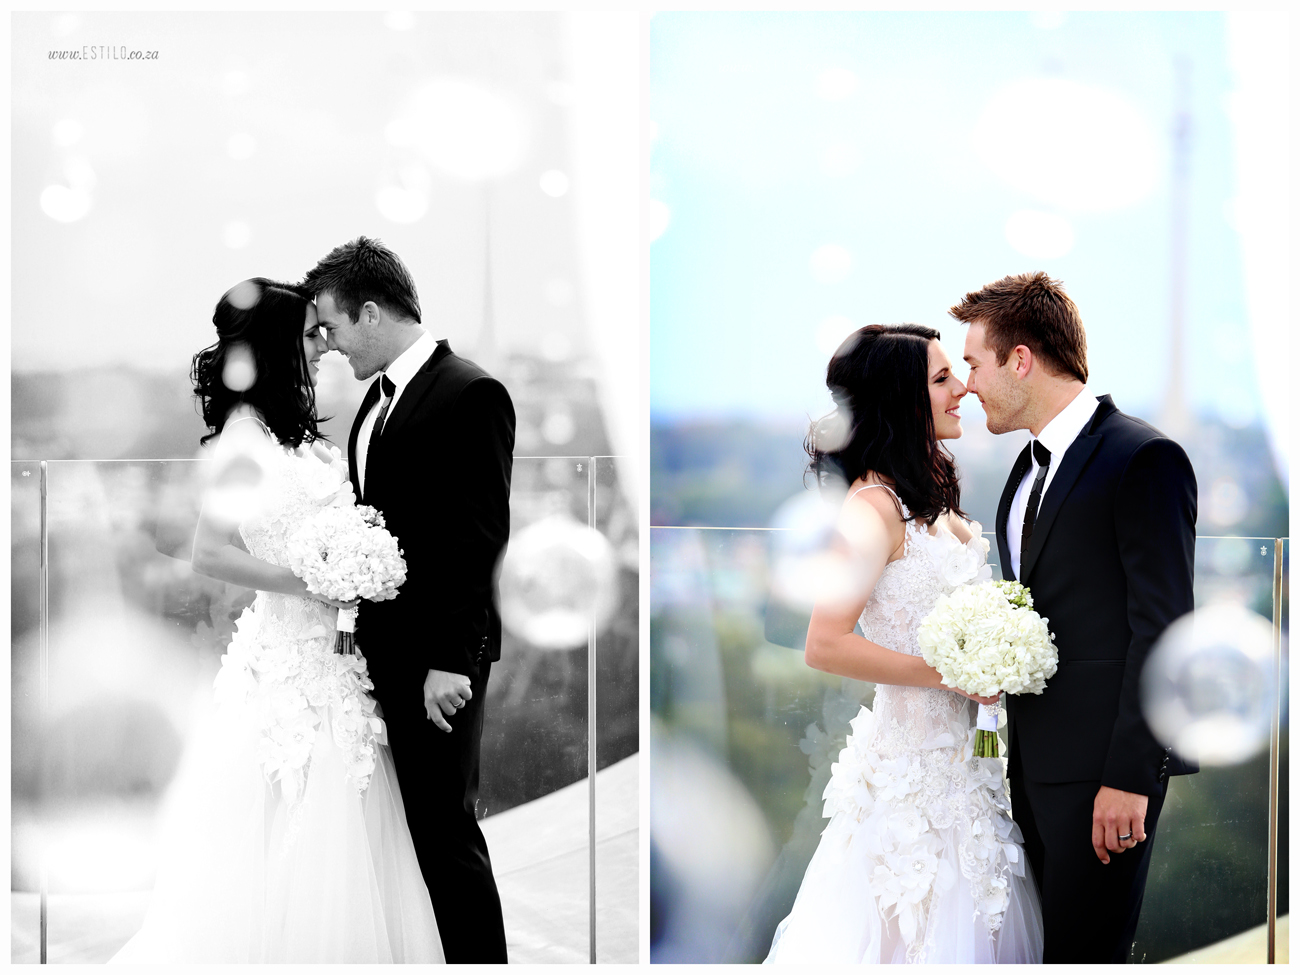 johannesburg-wedding-photographers-wedding-at-randlords-best-wedding-photographers-south-africa_0027.jpg